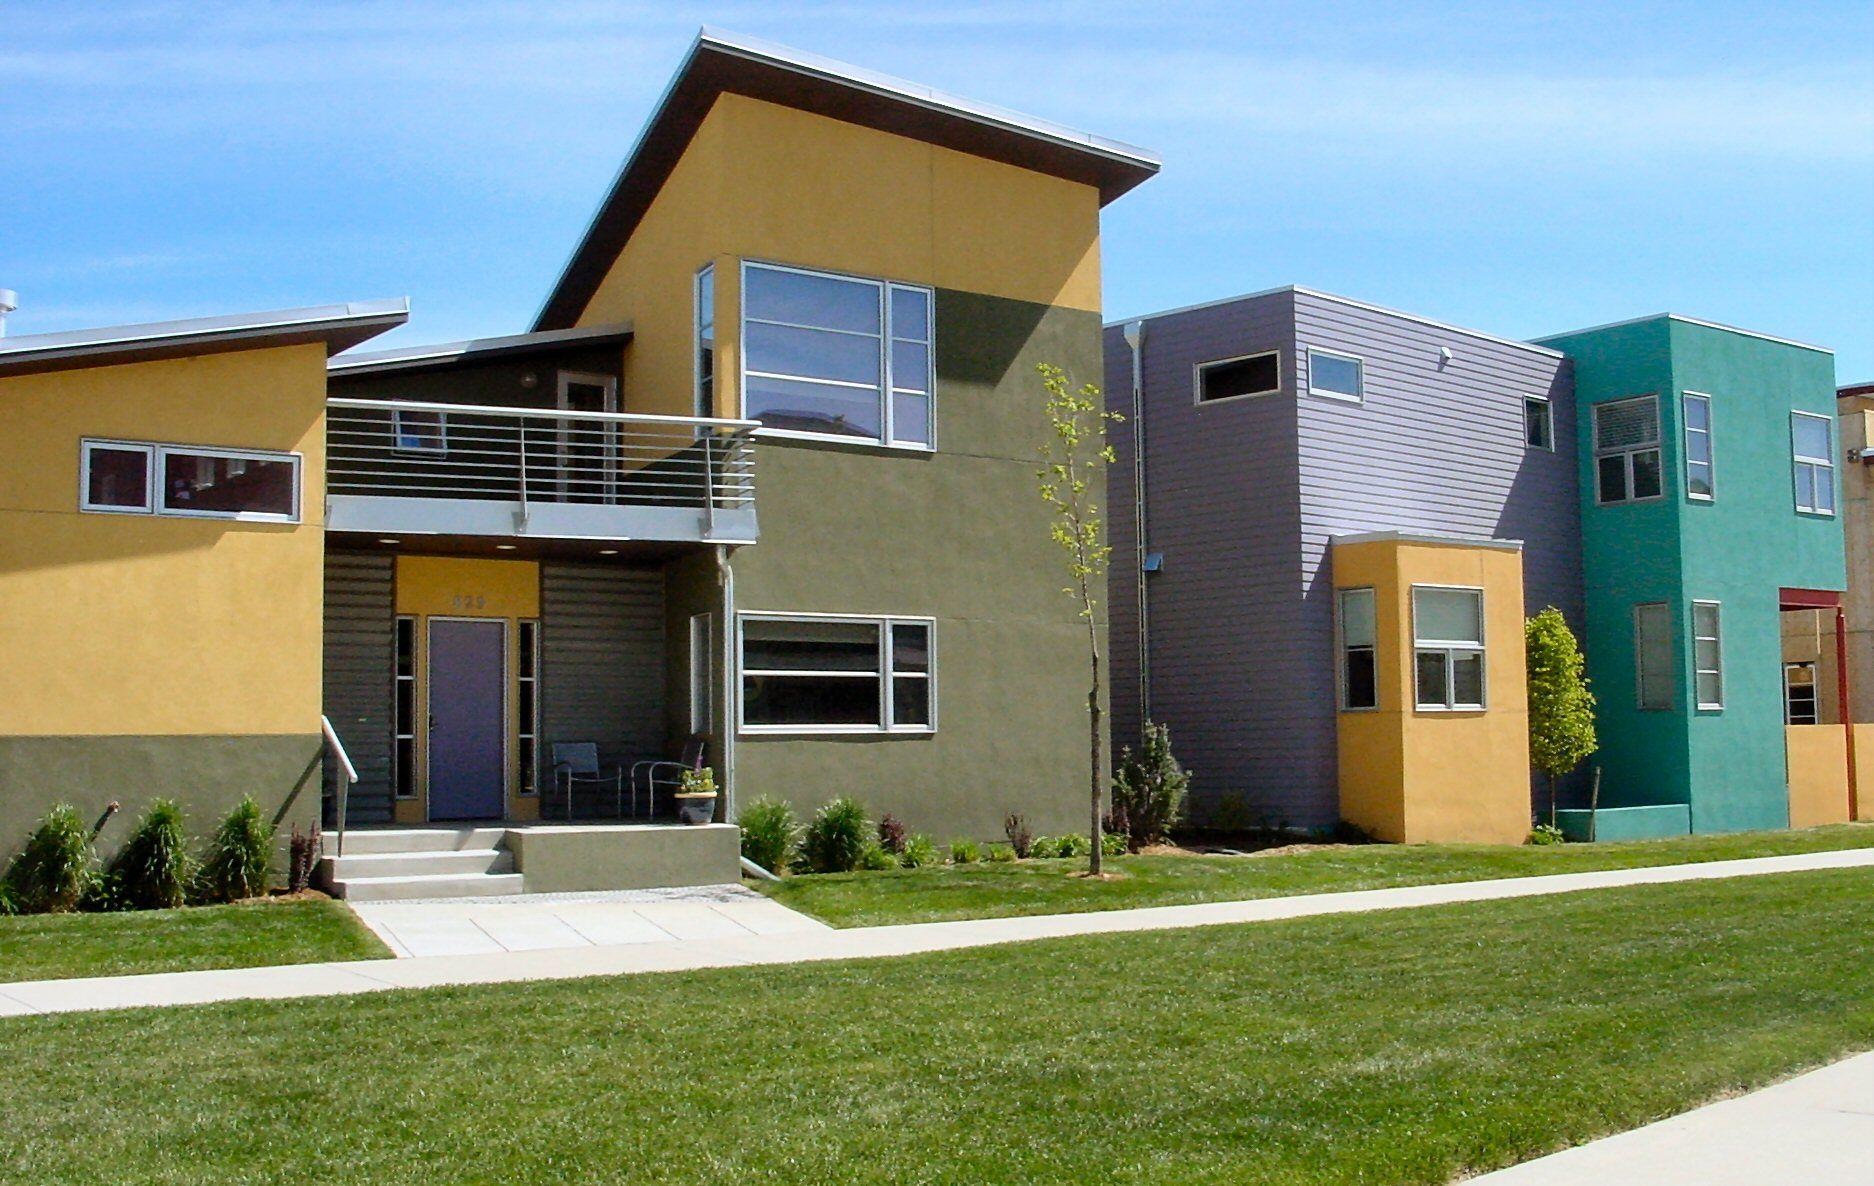 Modern Houses | ... Characteristics of Modern Houses | Backyard ...